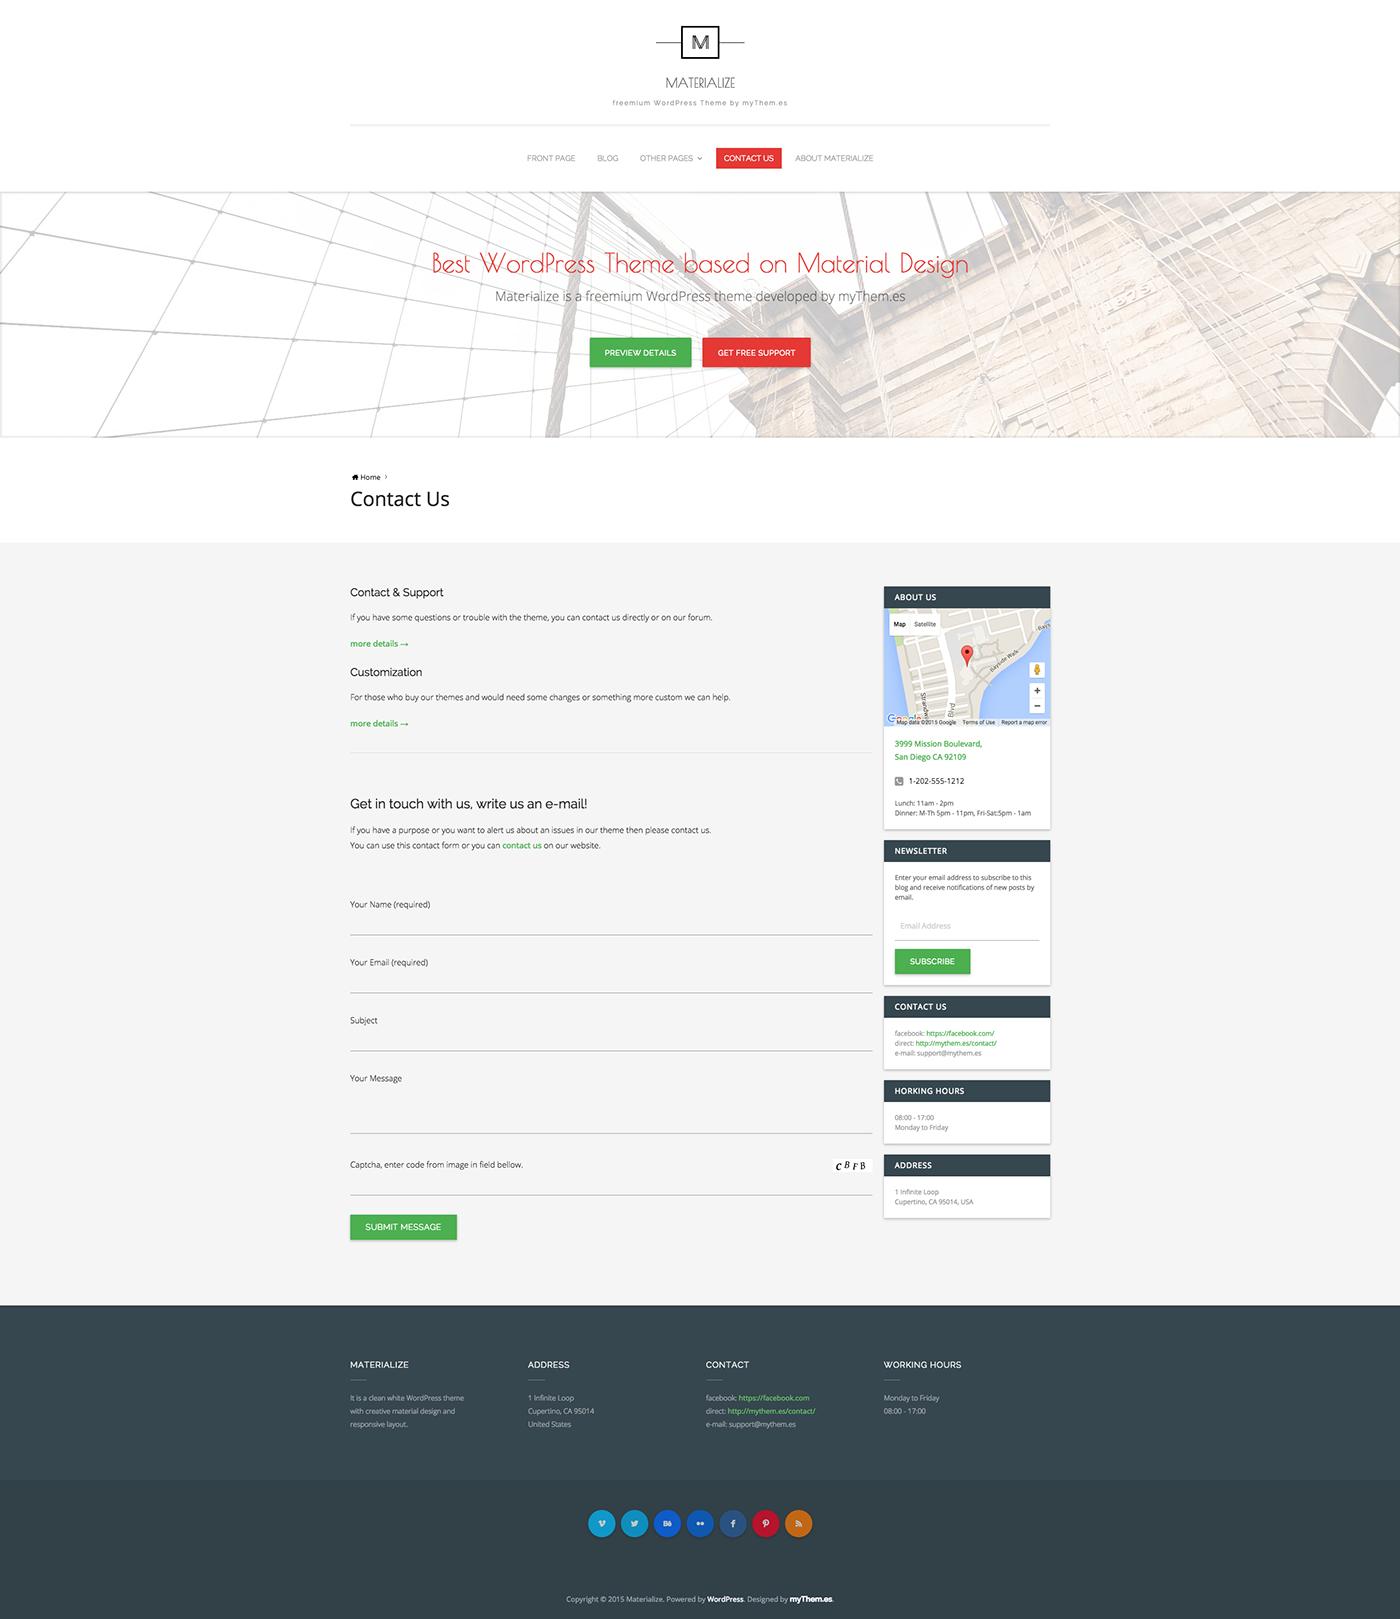 material design materialize Materializecss CSS Framework freemium wordpress creative clean White myThemes business portfolio Blog